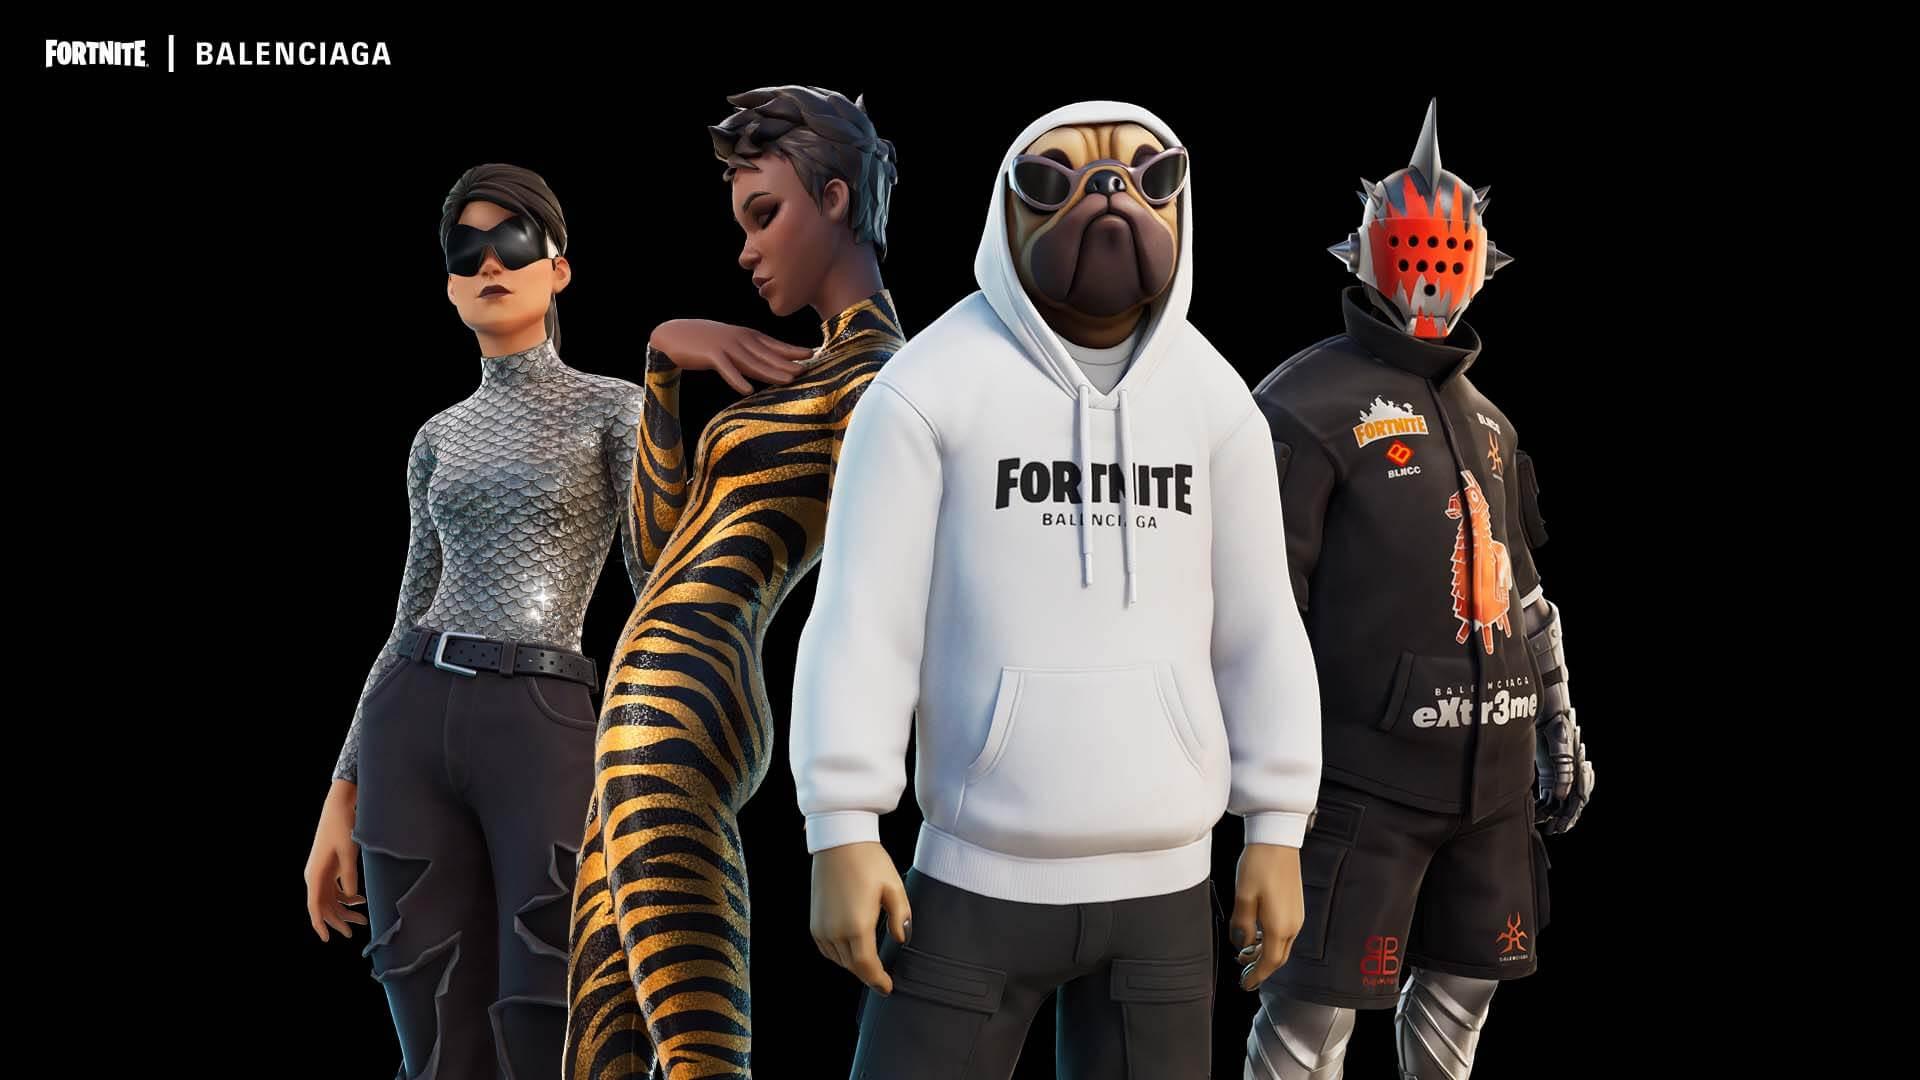 Fortnite recebe roupas e acessórios oficiais Balenciaga – Jogos – Tecnoblog